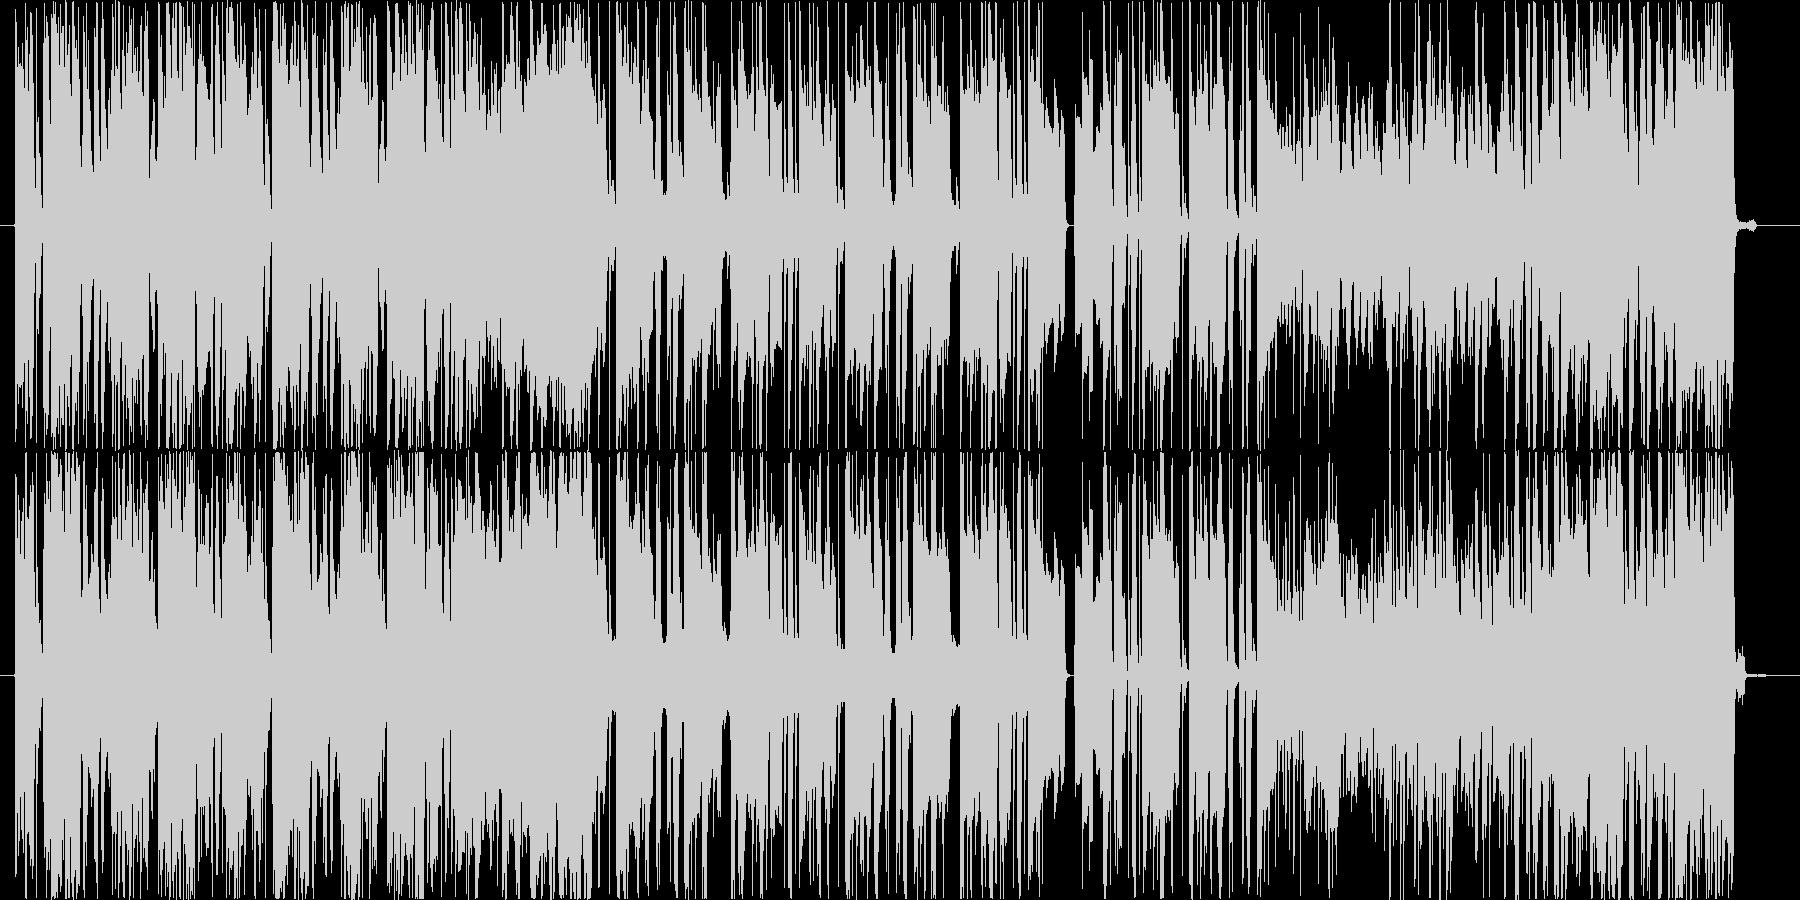 jazzテイストのエレピ音源メインの楽…の未再生の波形